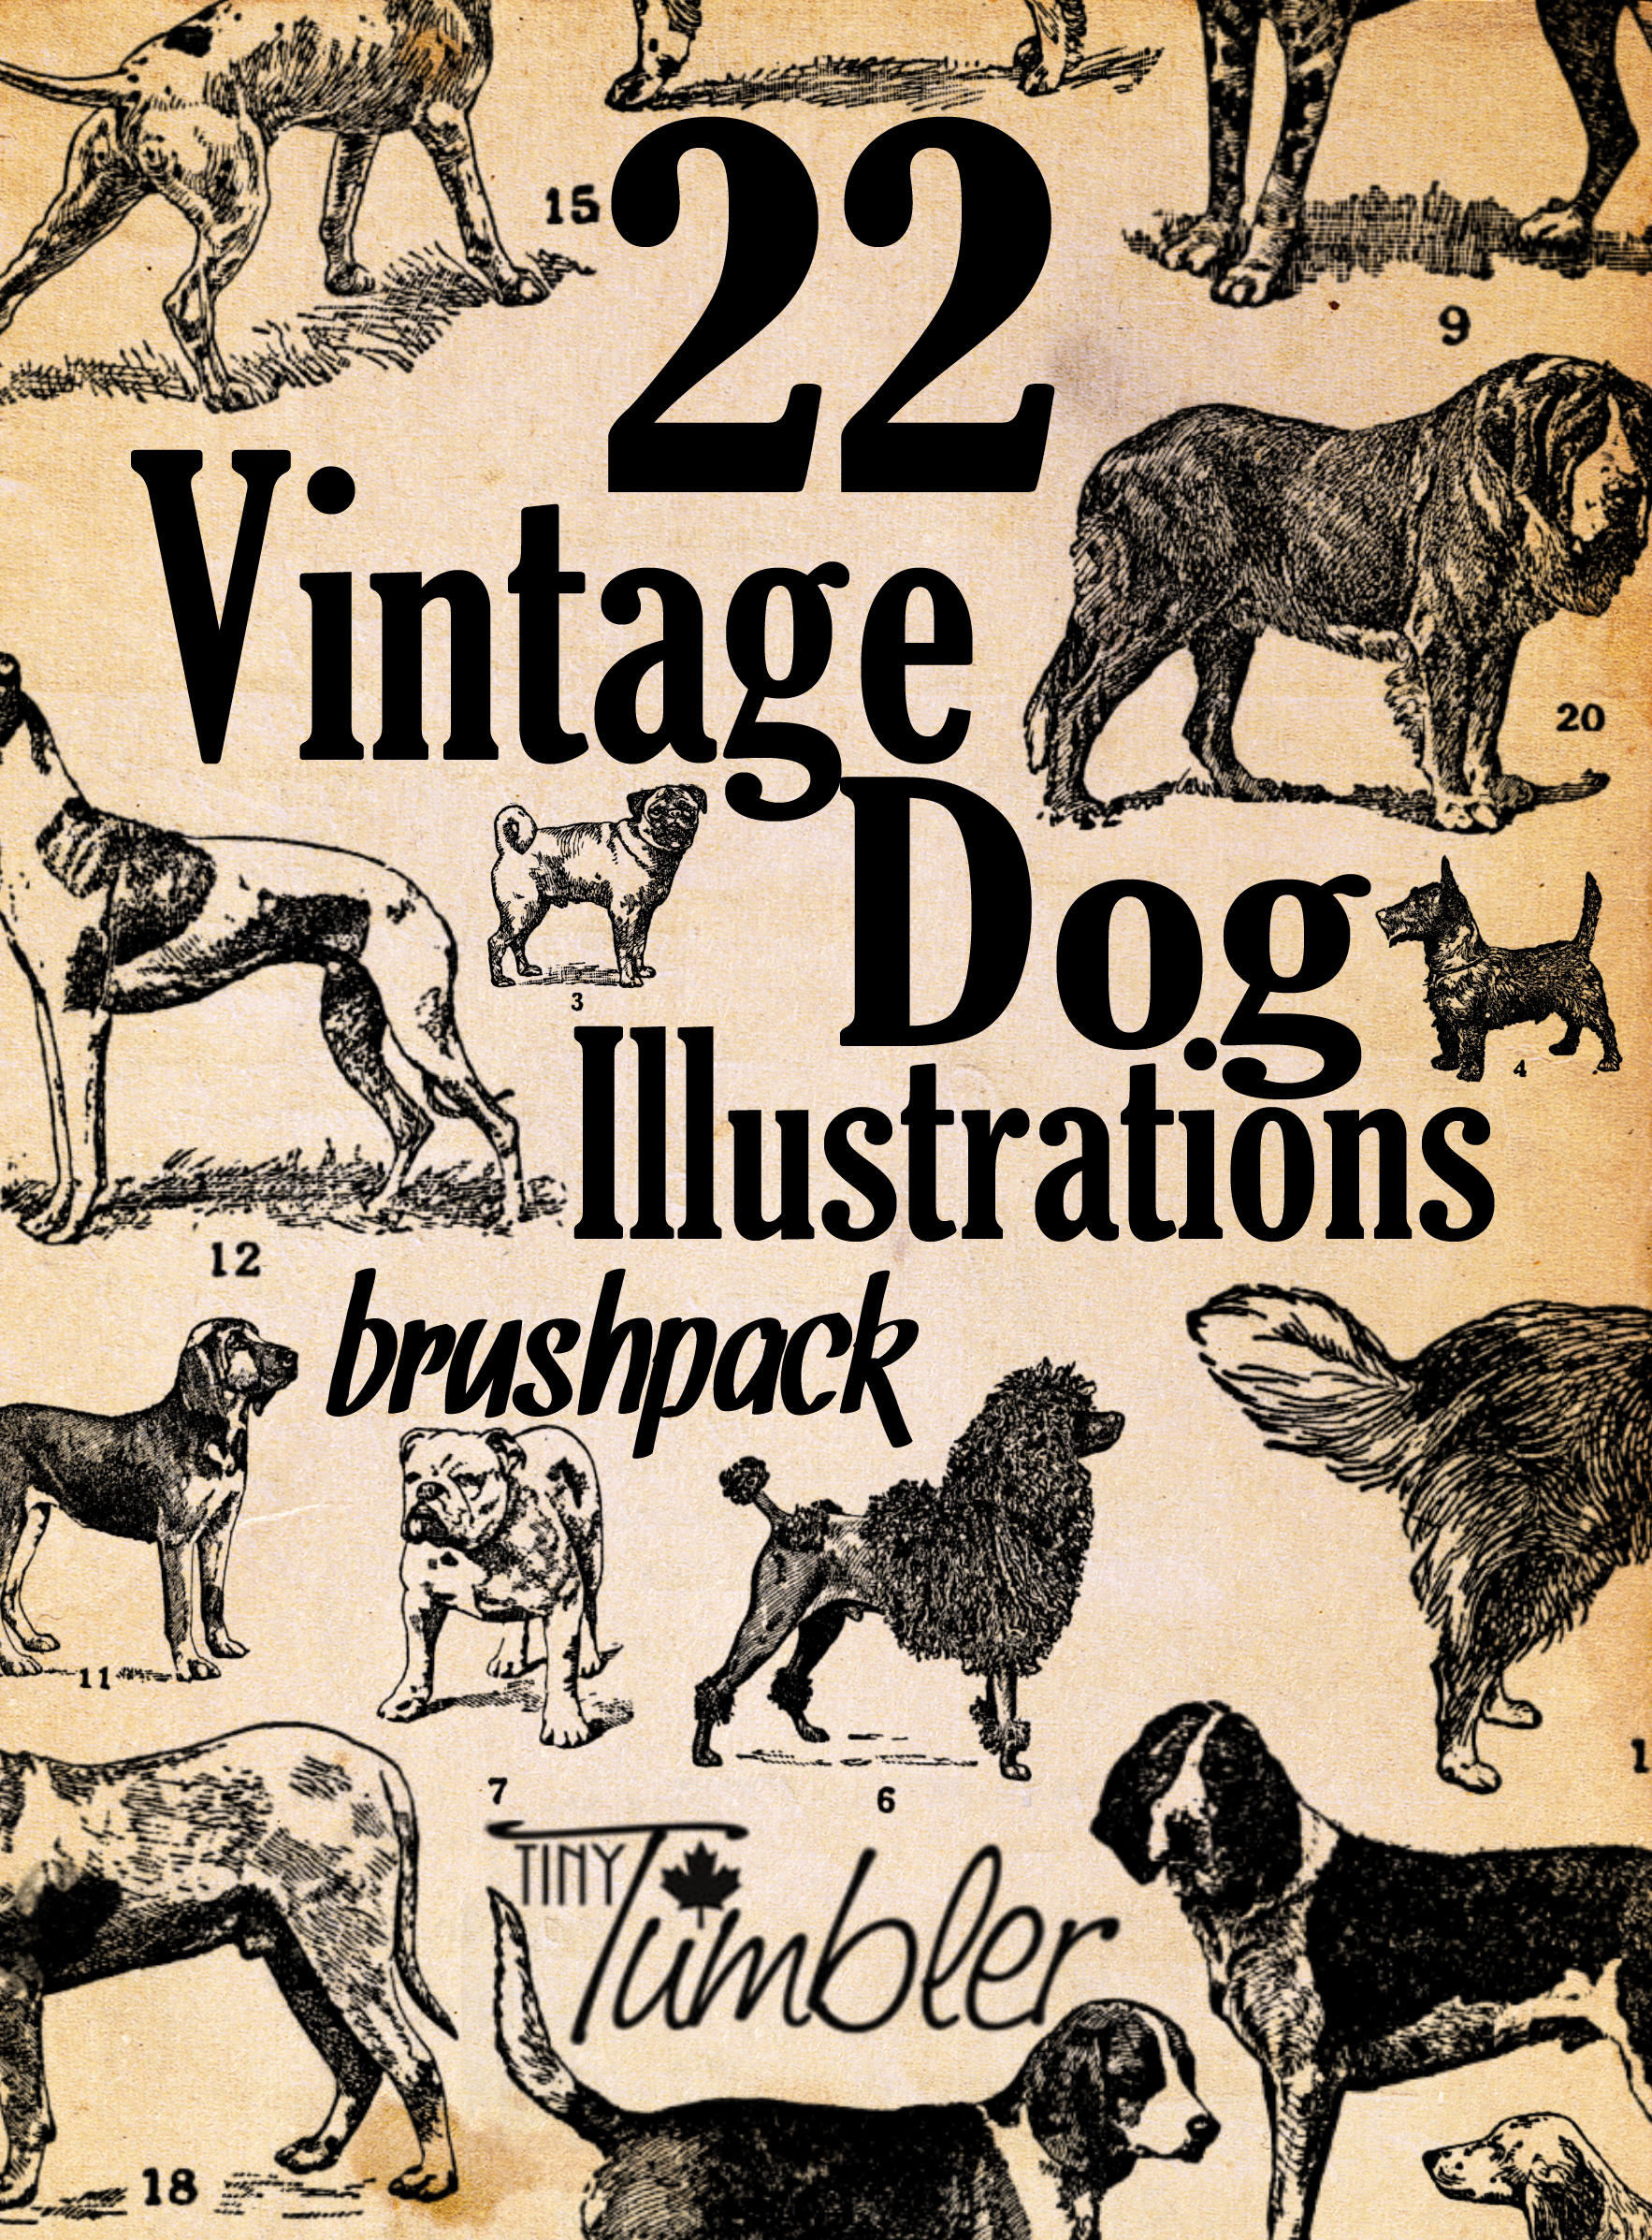 22 Vintage Dog Illustrations Brushpack by TinyTumbler